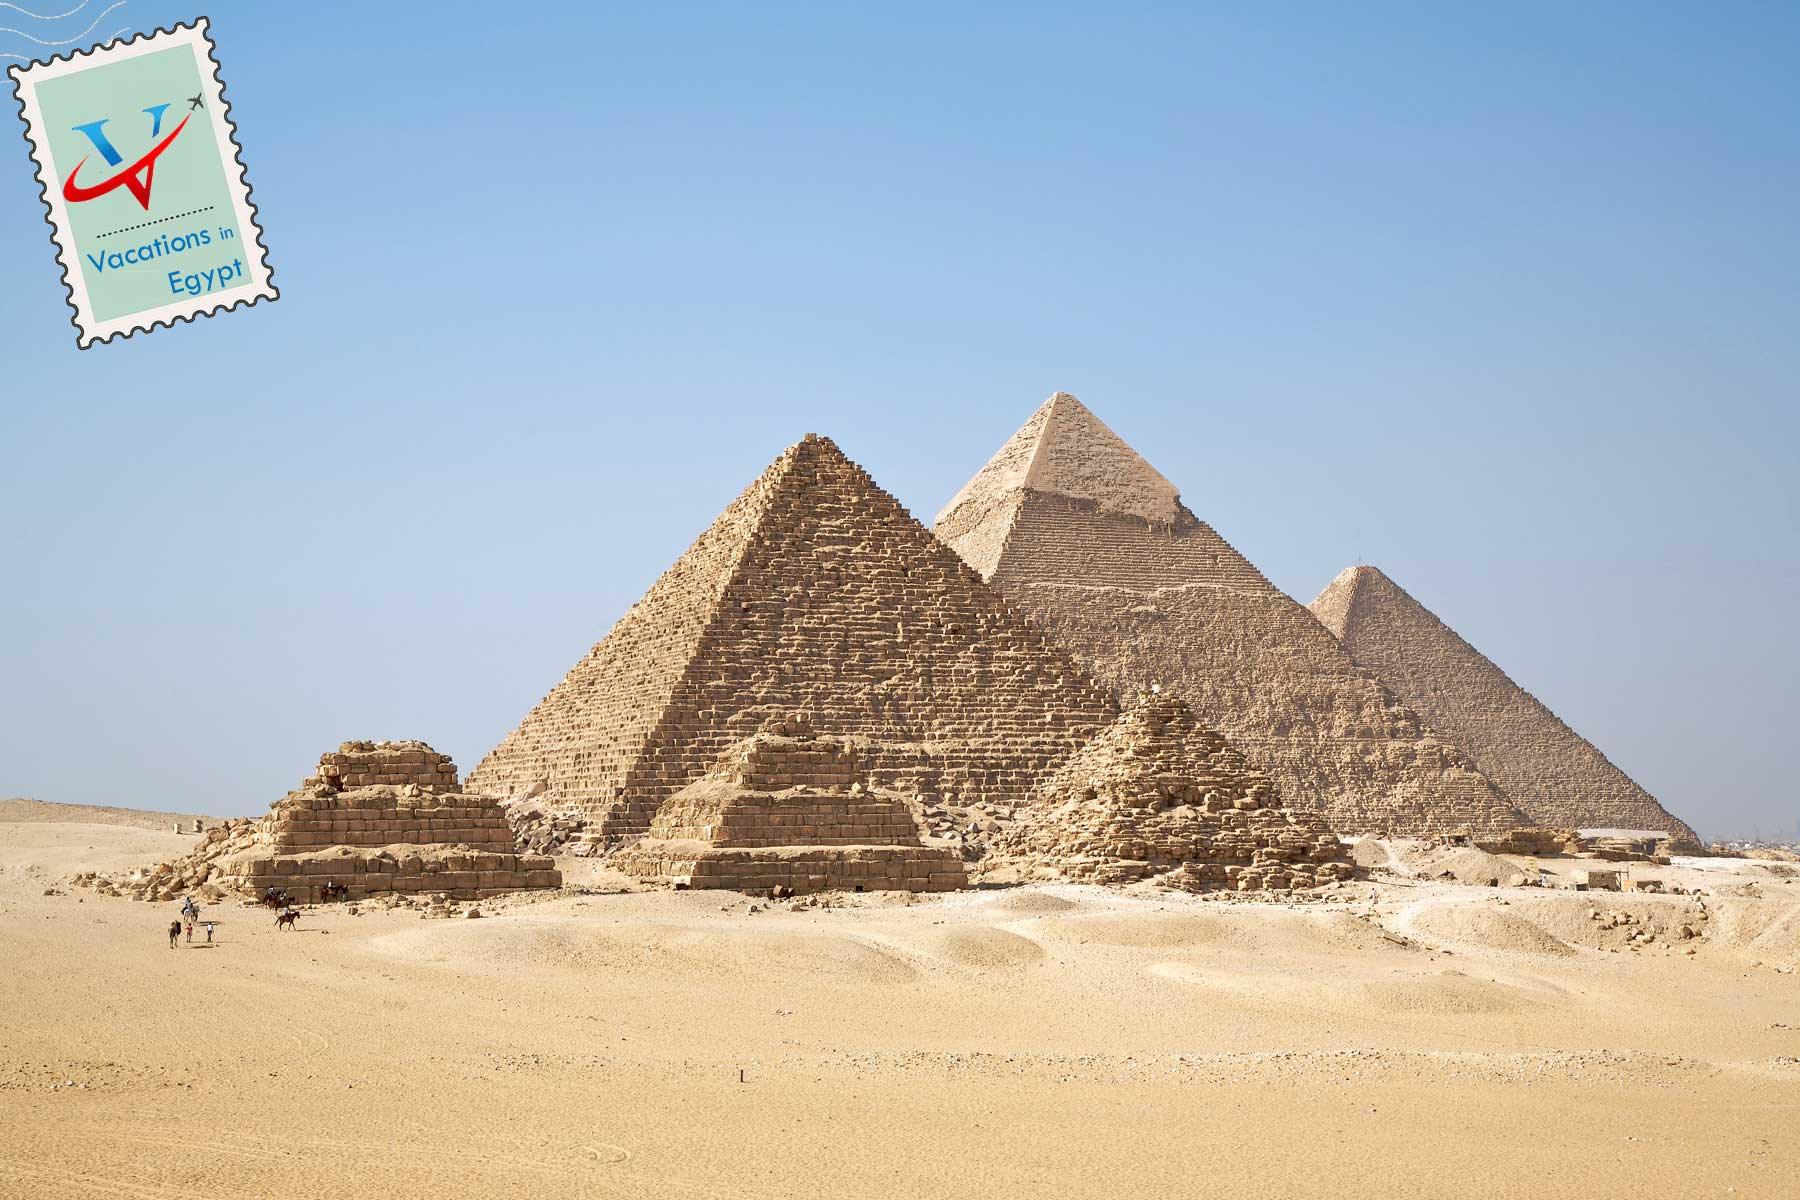 pyramids of giza tour